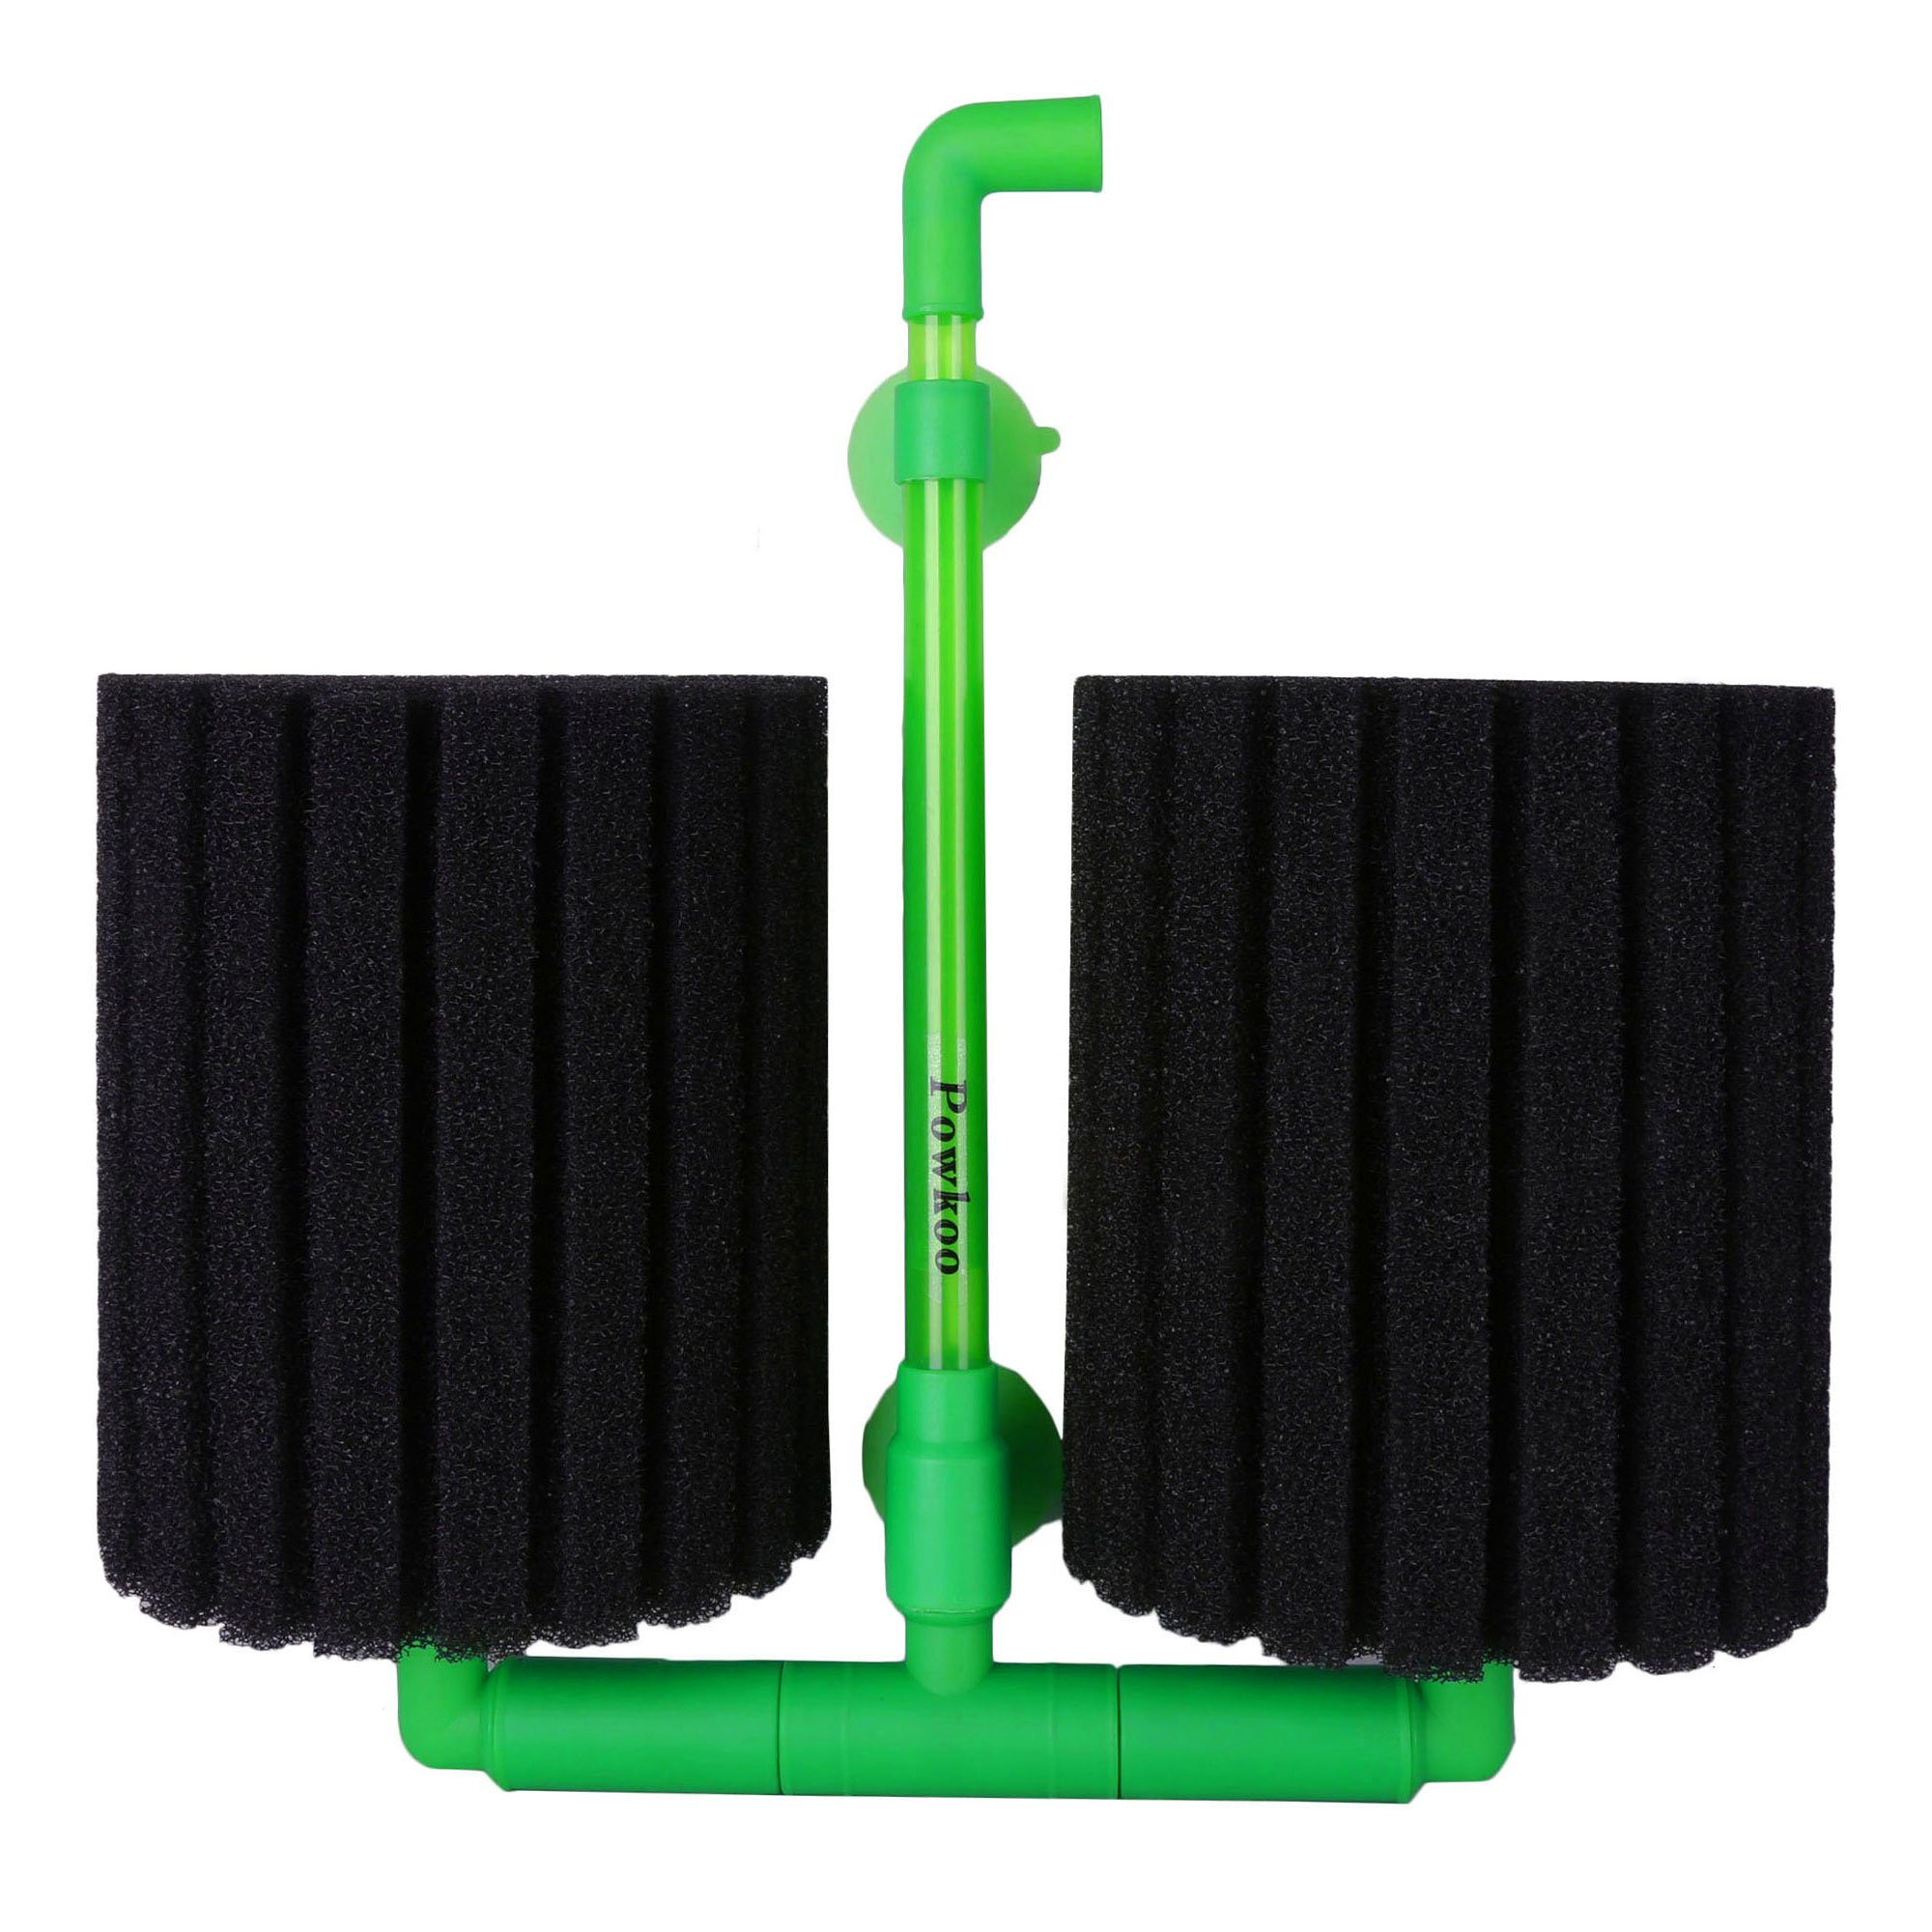 Powkoo Aquarium Sponge Filter Fish Tank Air Pump Sponge Filter Bio Prefilter (XL)